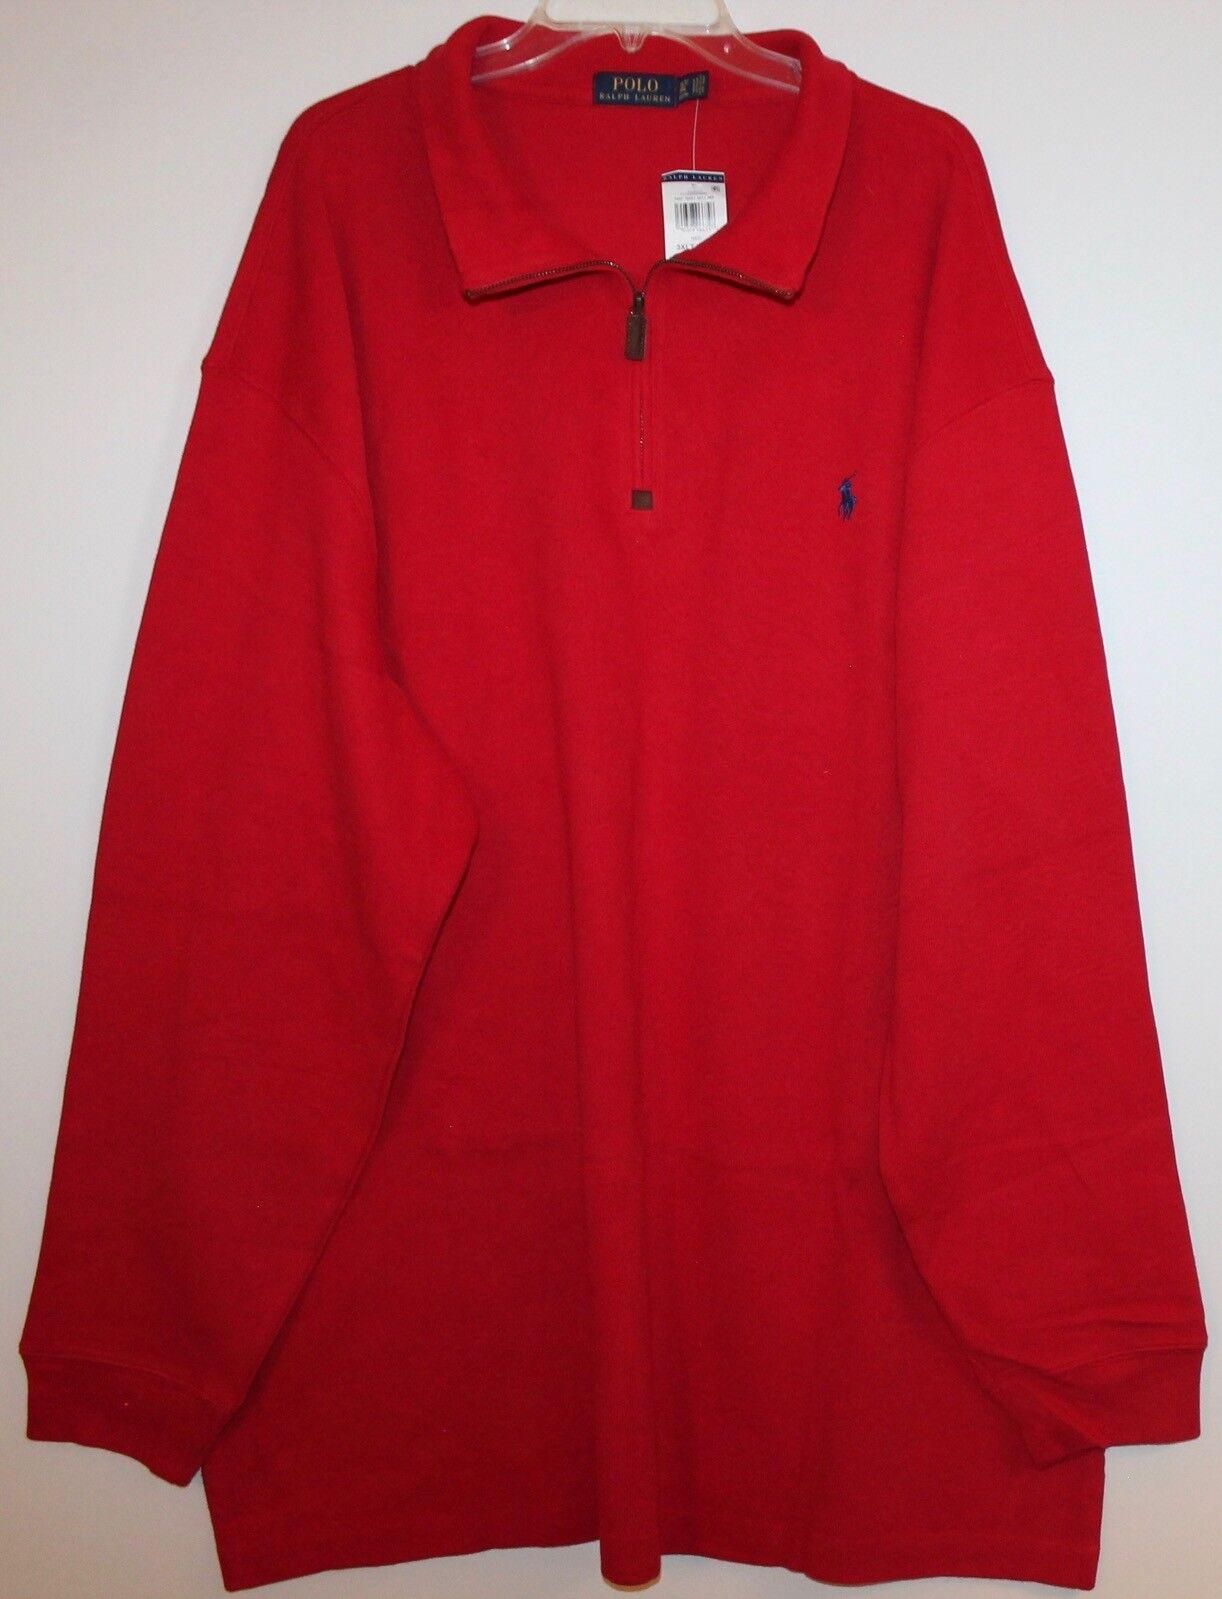 Polo Ralph Lauren Big and Tall  Herren ROT 1/2 Zip Cotton Sweater NWT 125 3XLT